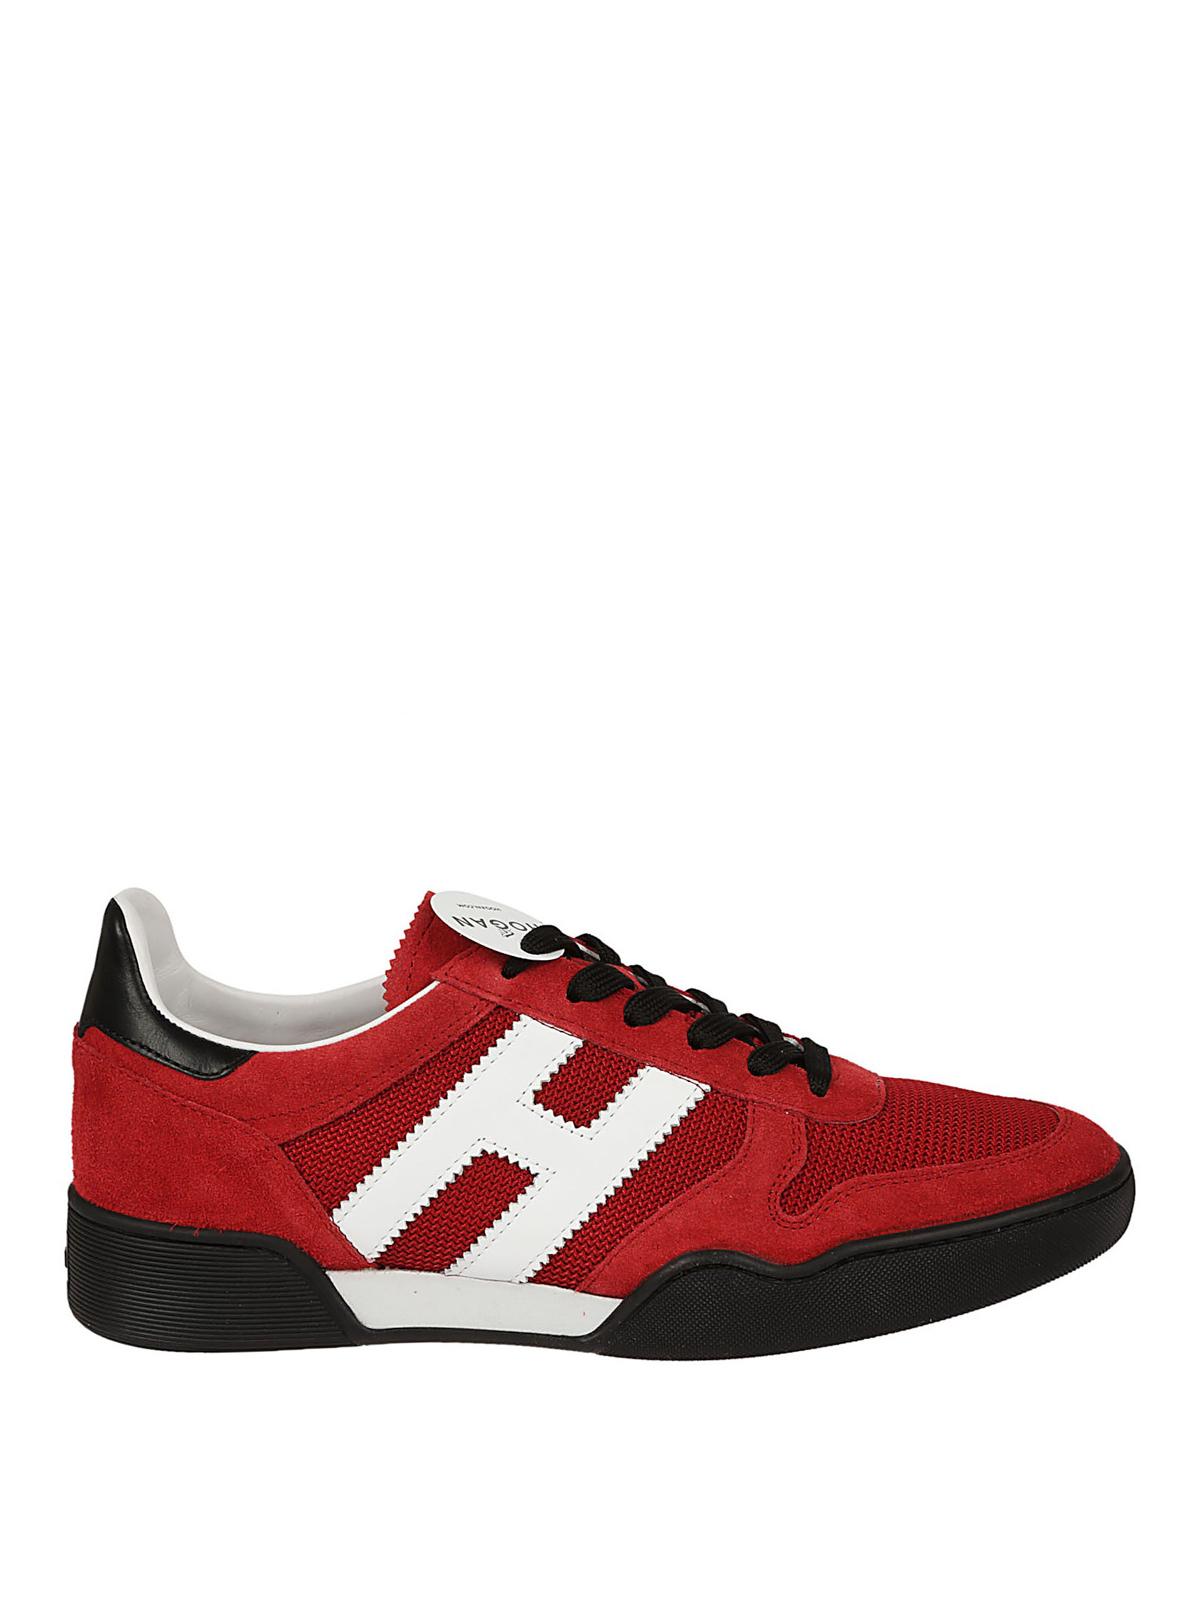 Baskets H357 Rouge Hogan TvcFAHWBhY